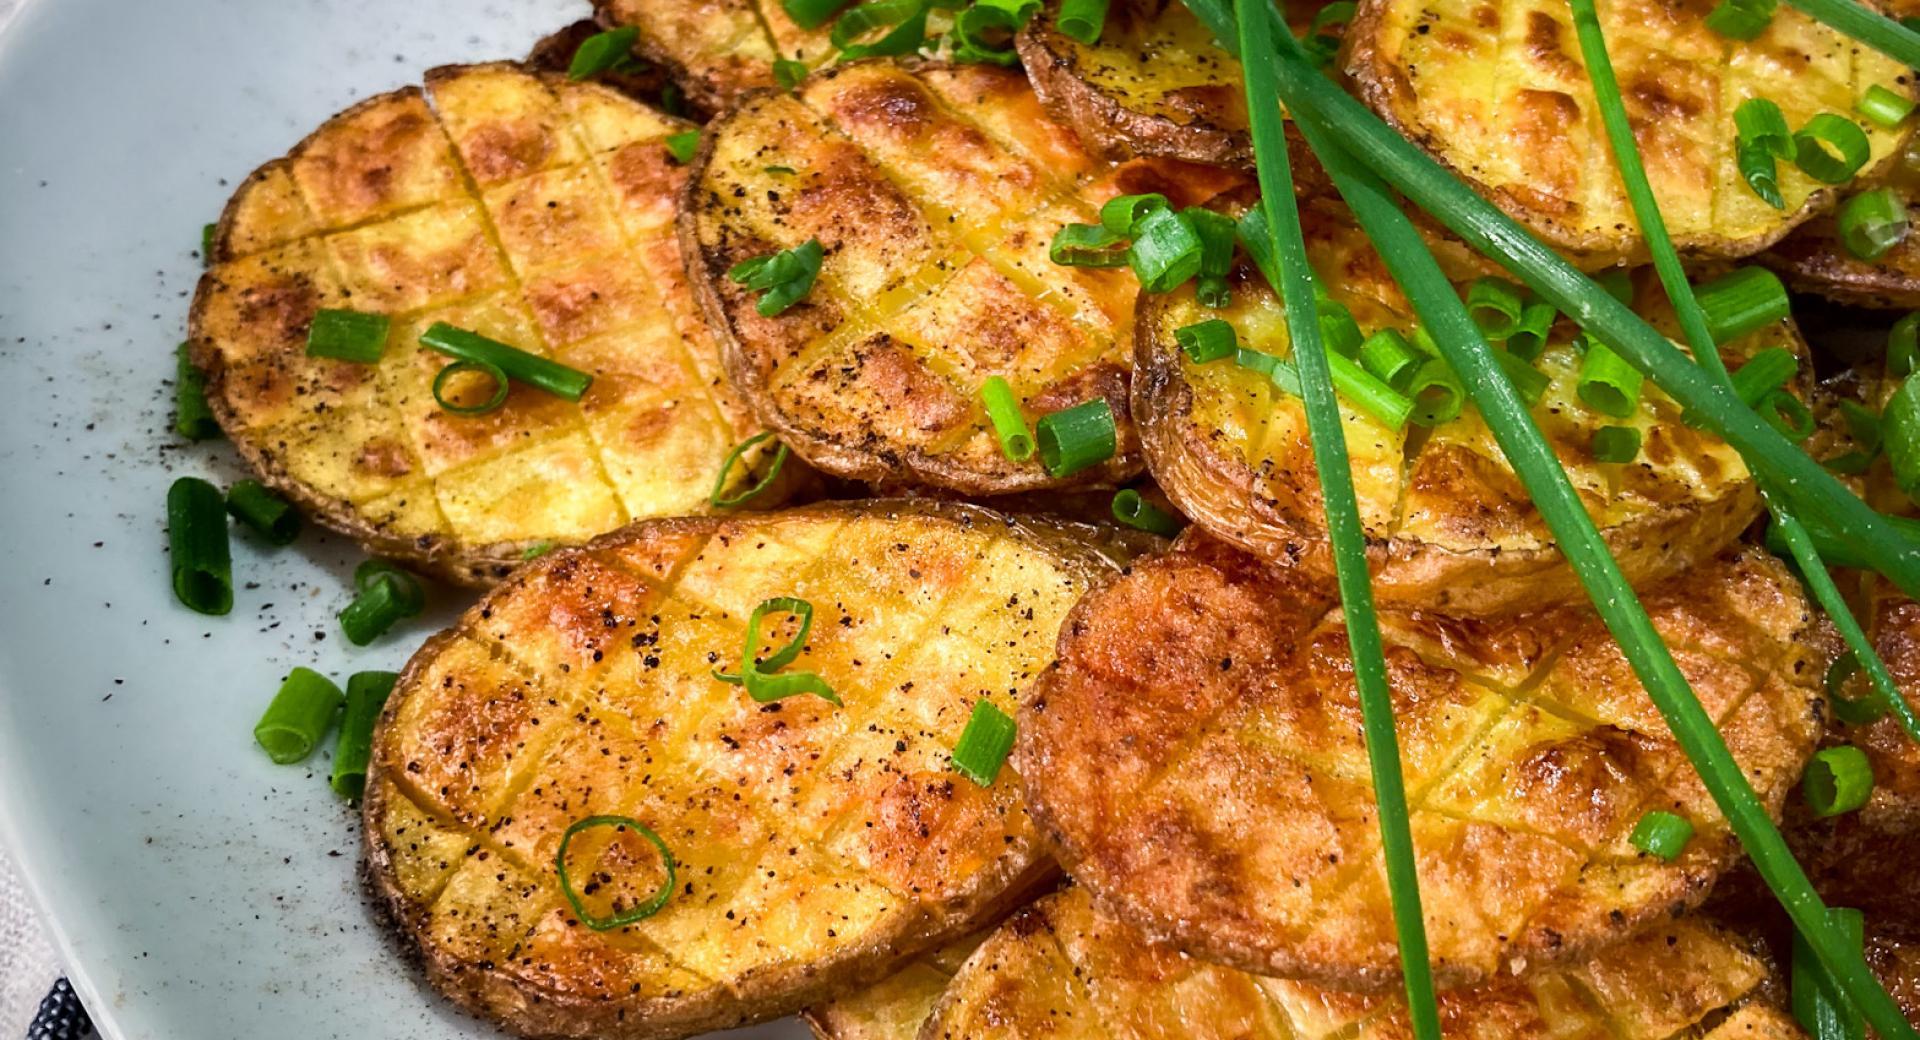 Potato Griddies